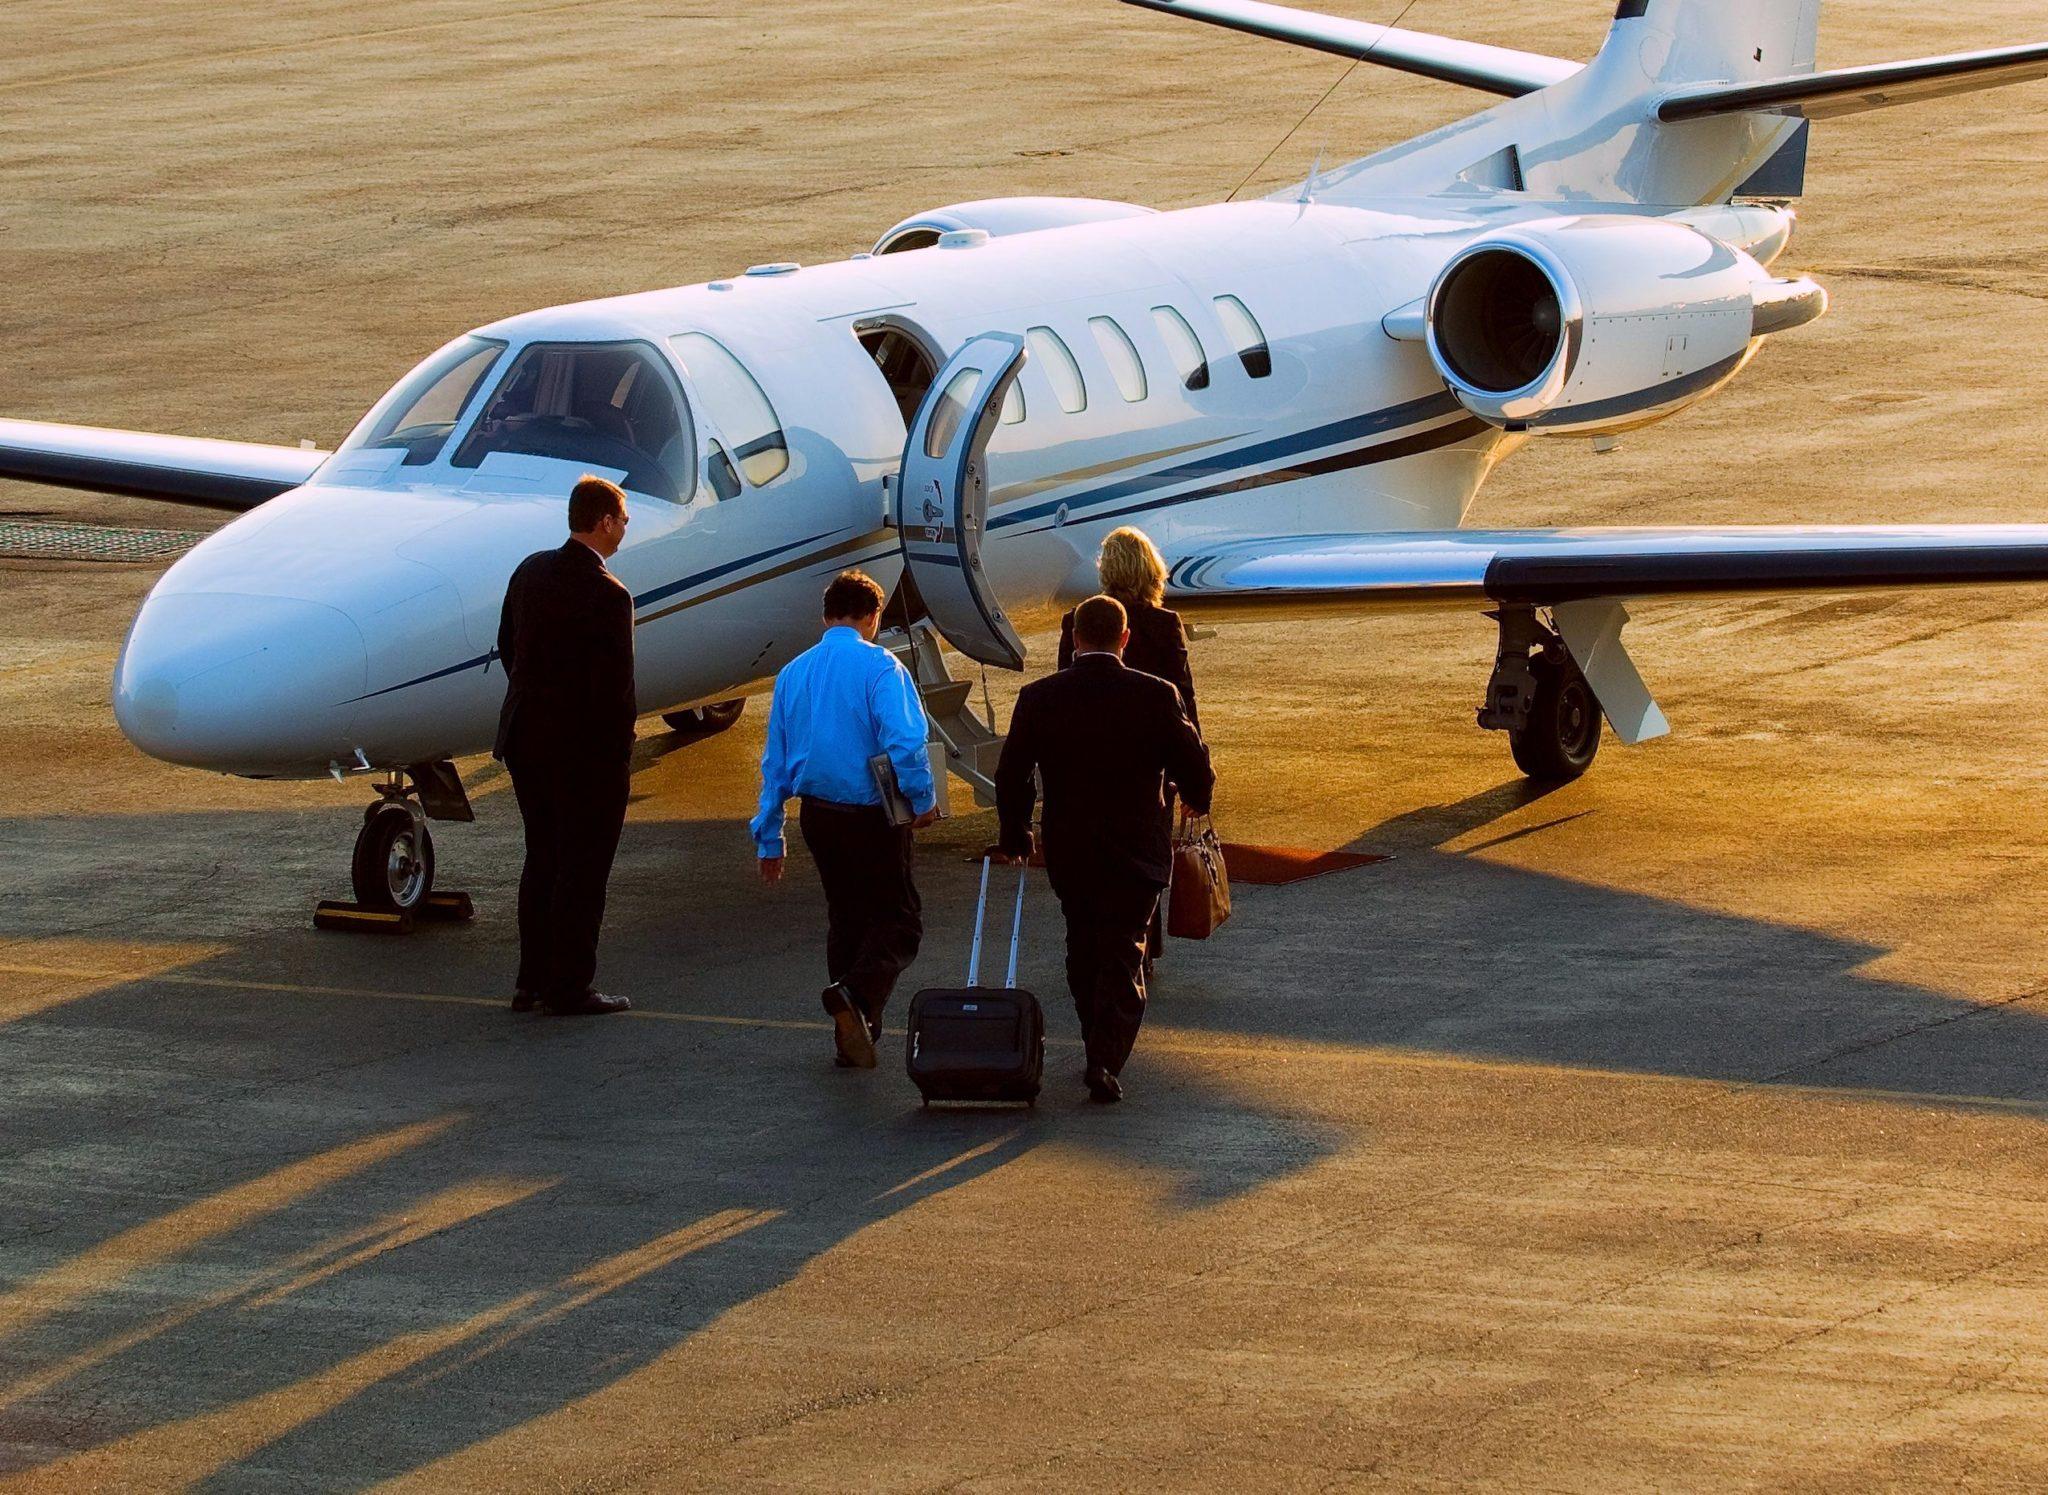 biznes aviatsiya - Деловая авиация, как ключ к успеху